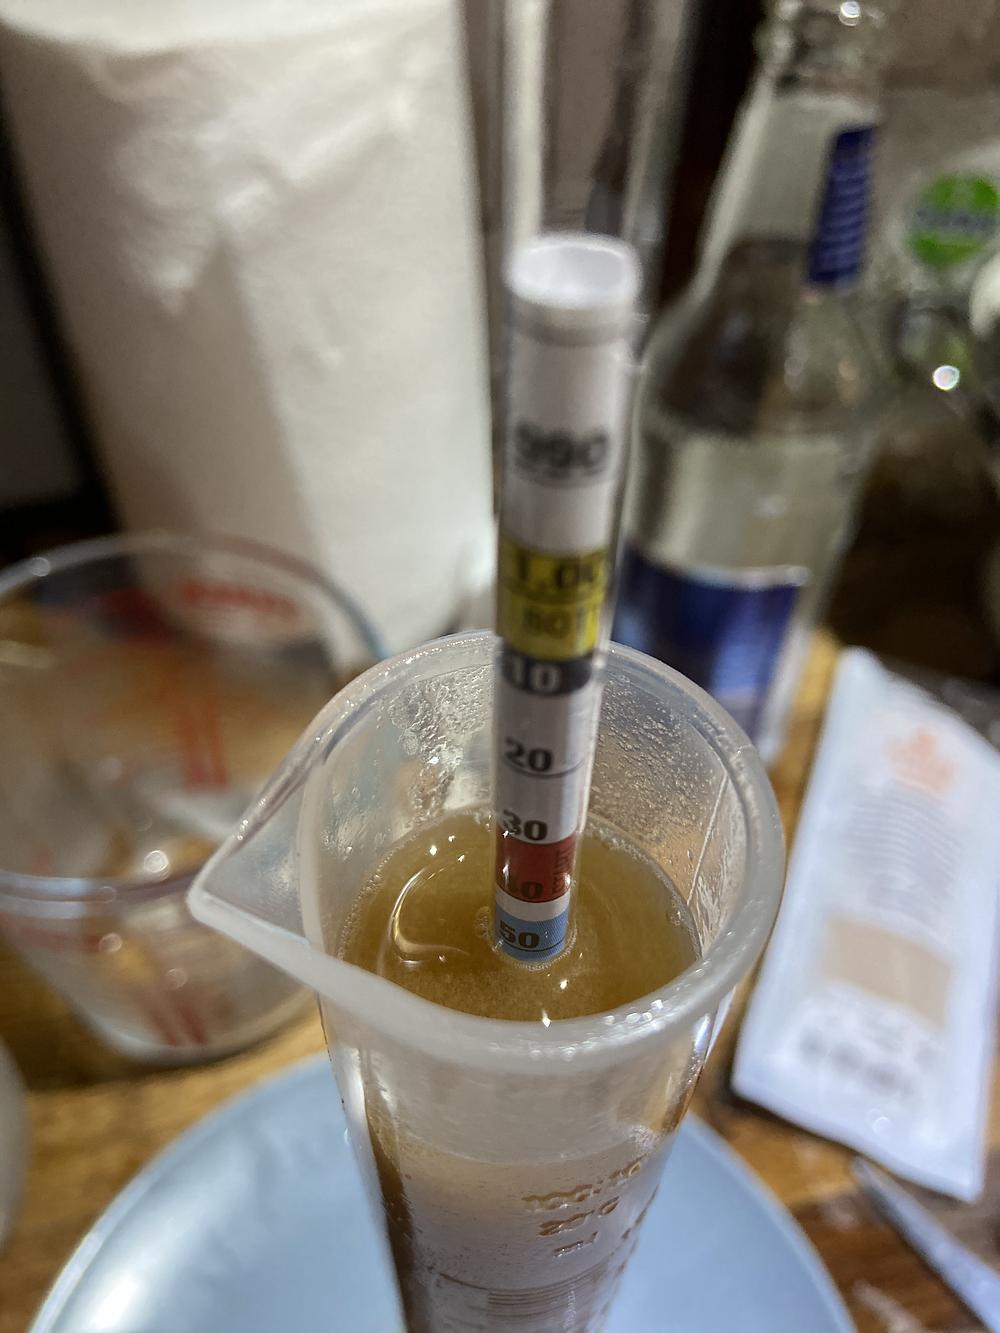 American pale ale original gravity reading of 1.052